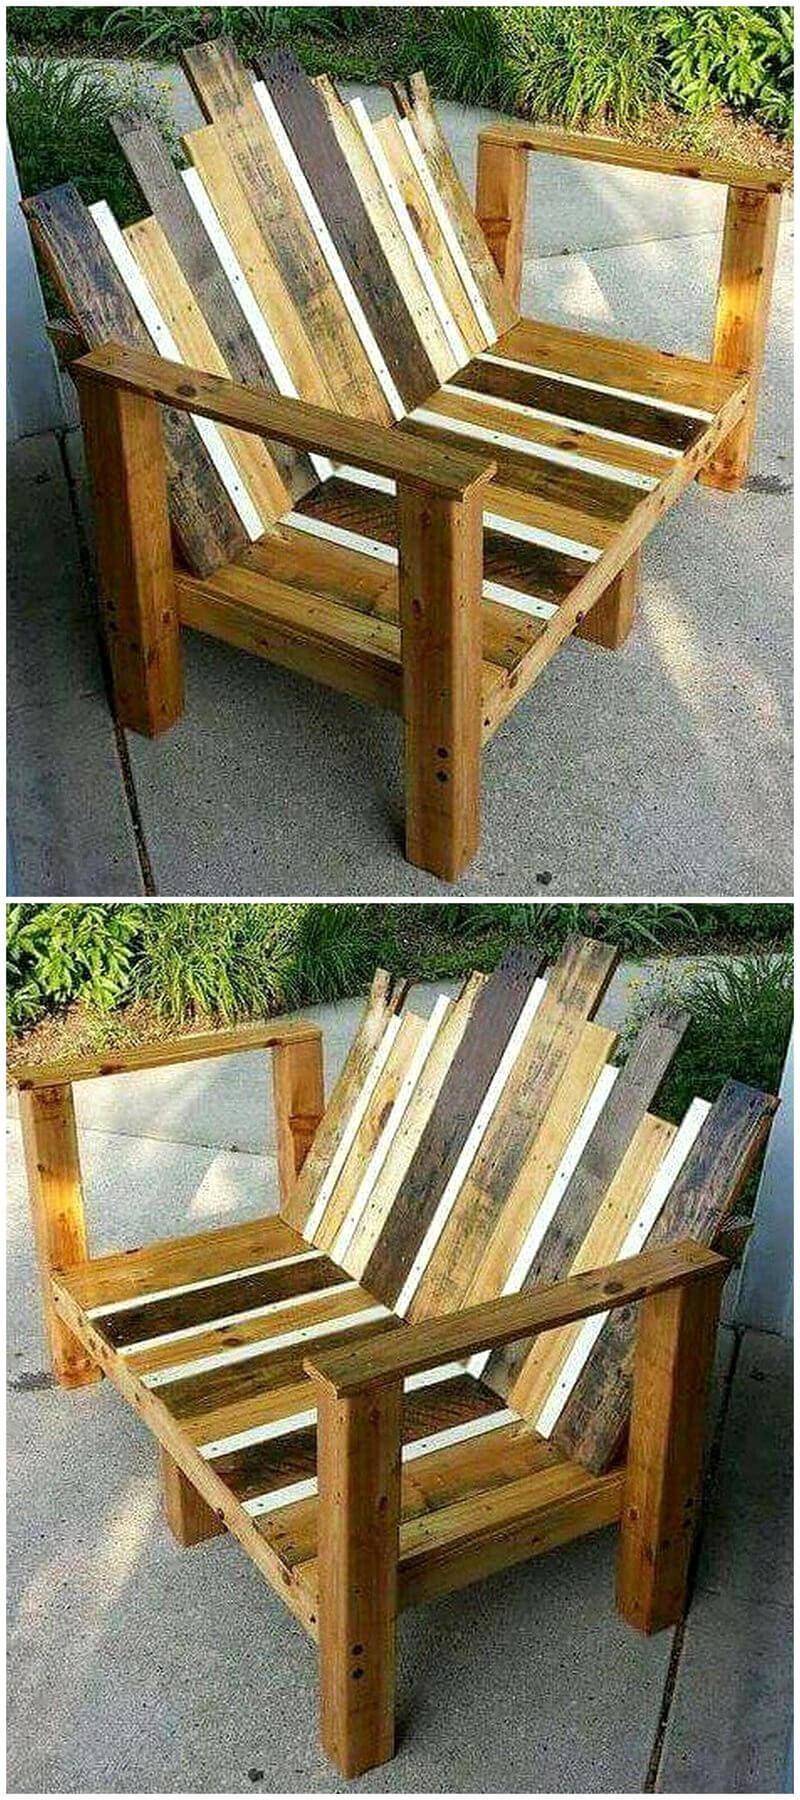 rustic look patio pallet bench